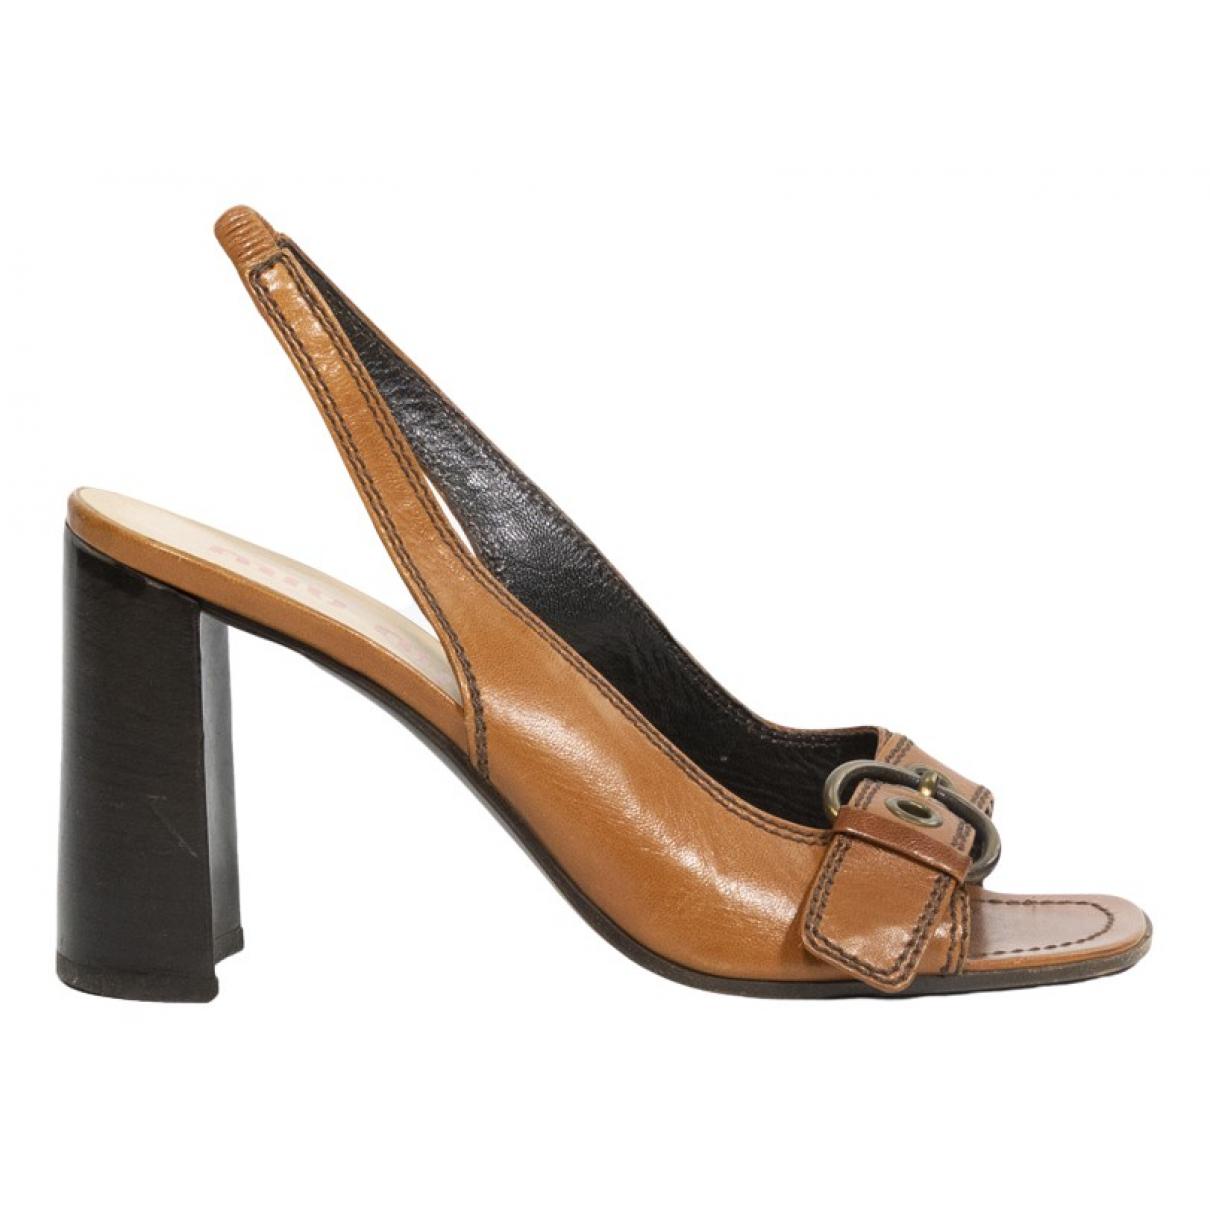 Miu Miu \N Brown Leather Sandals for Women 40 IT